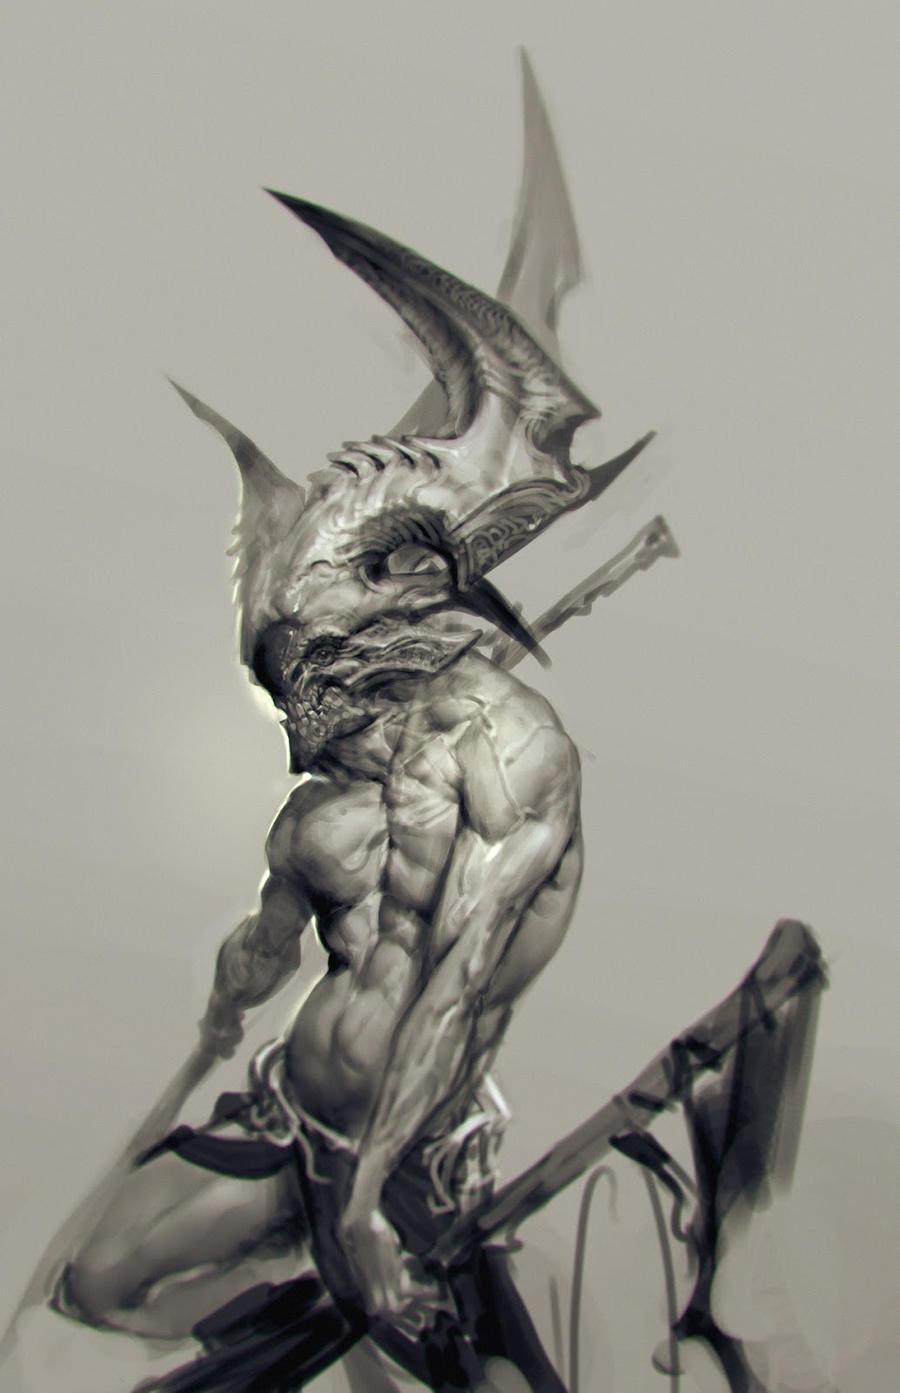 [Image: more_demons__by_robotpencil-d4xmqb1.jpg]